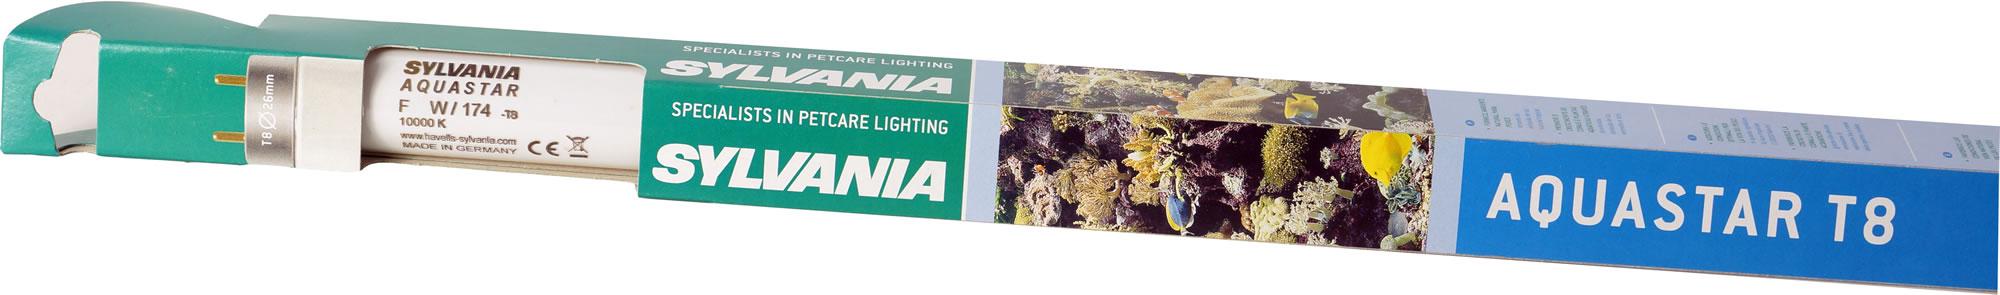 Sylvania Aquastar T8 Aquarium Leuchtstoffröhre Tageslicht